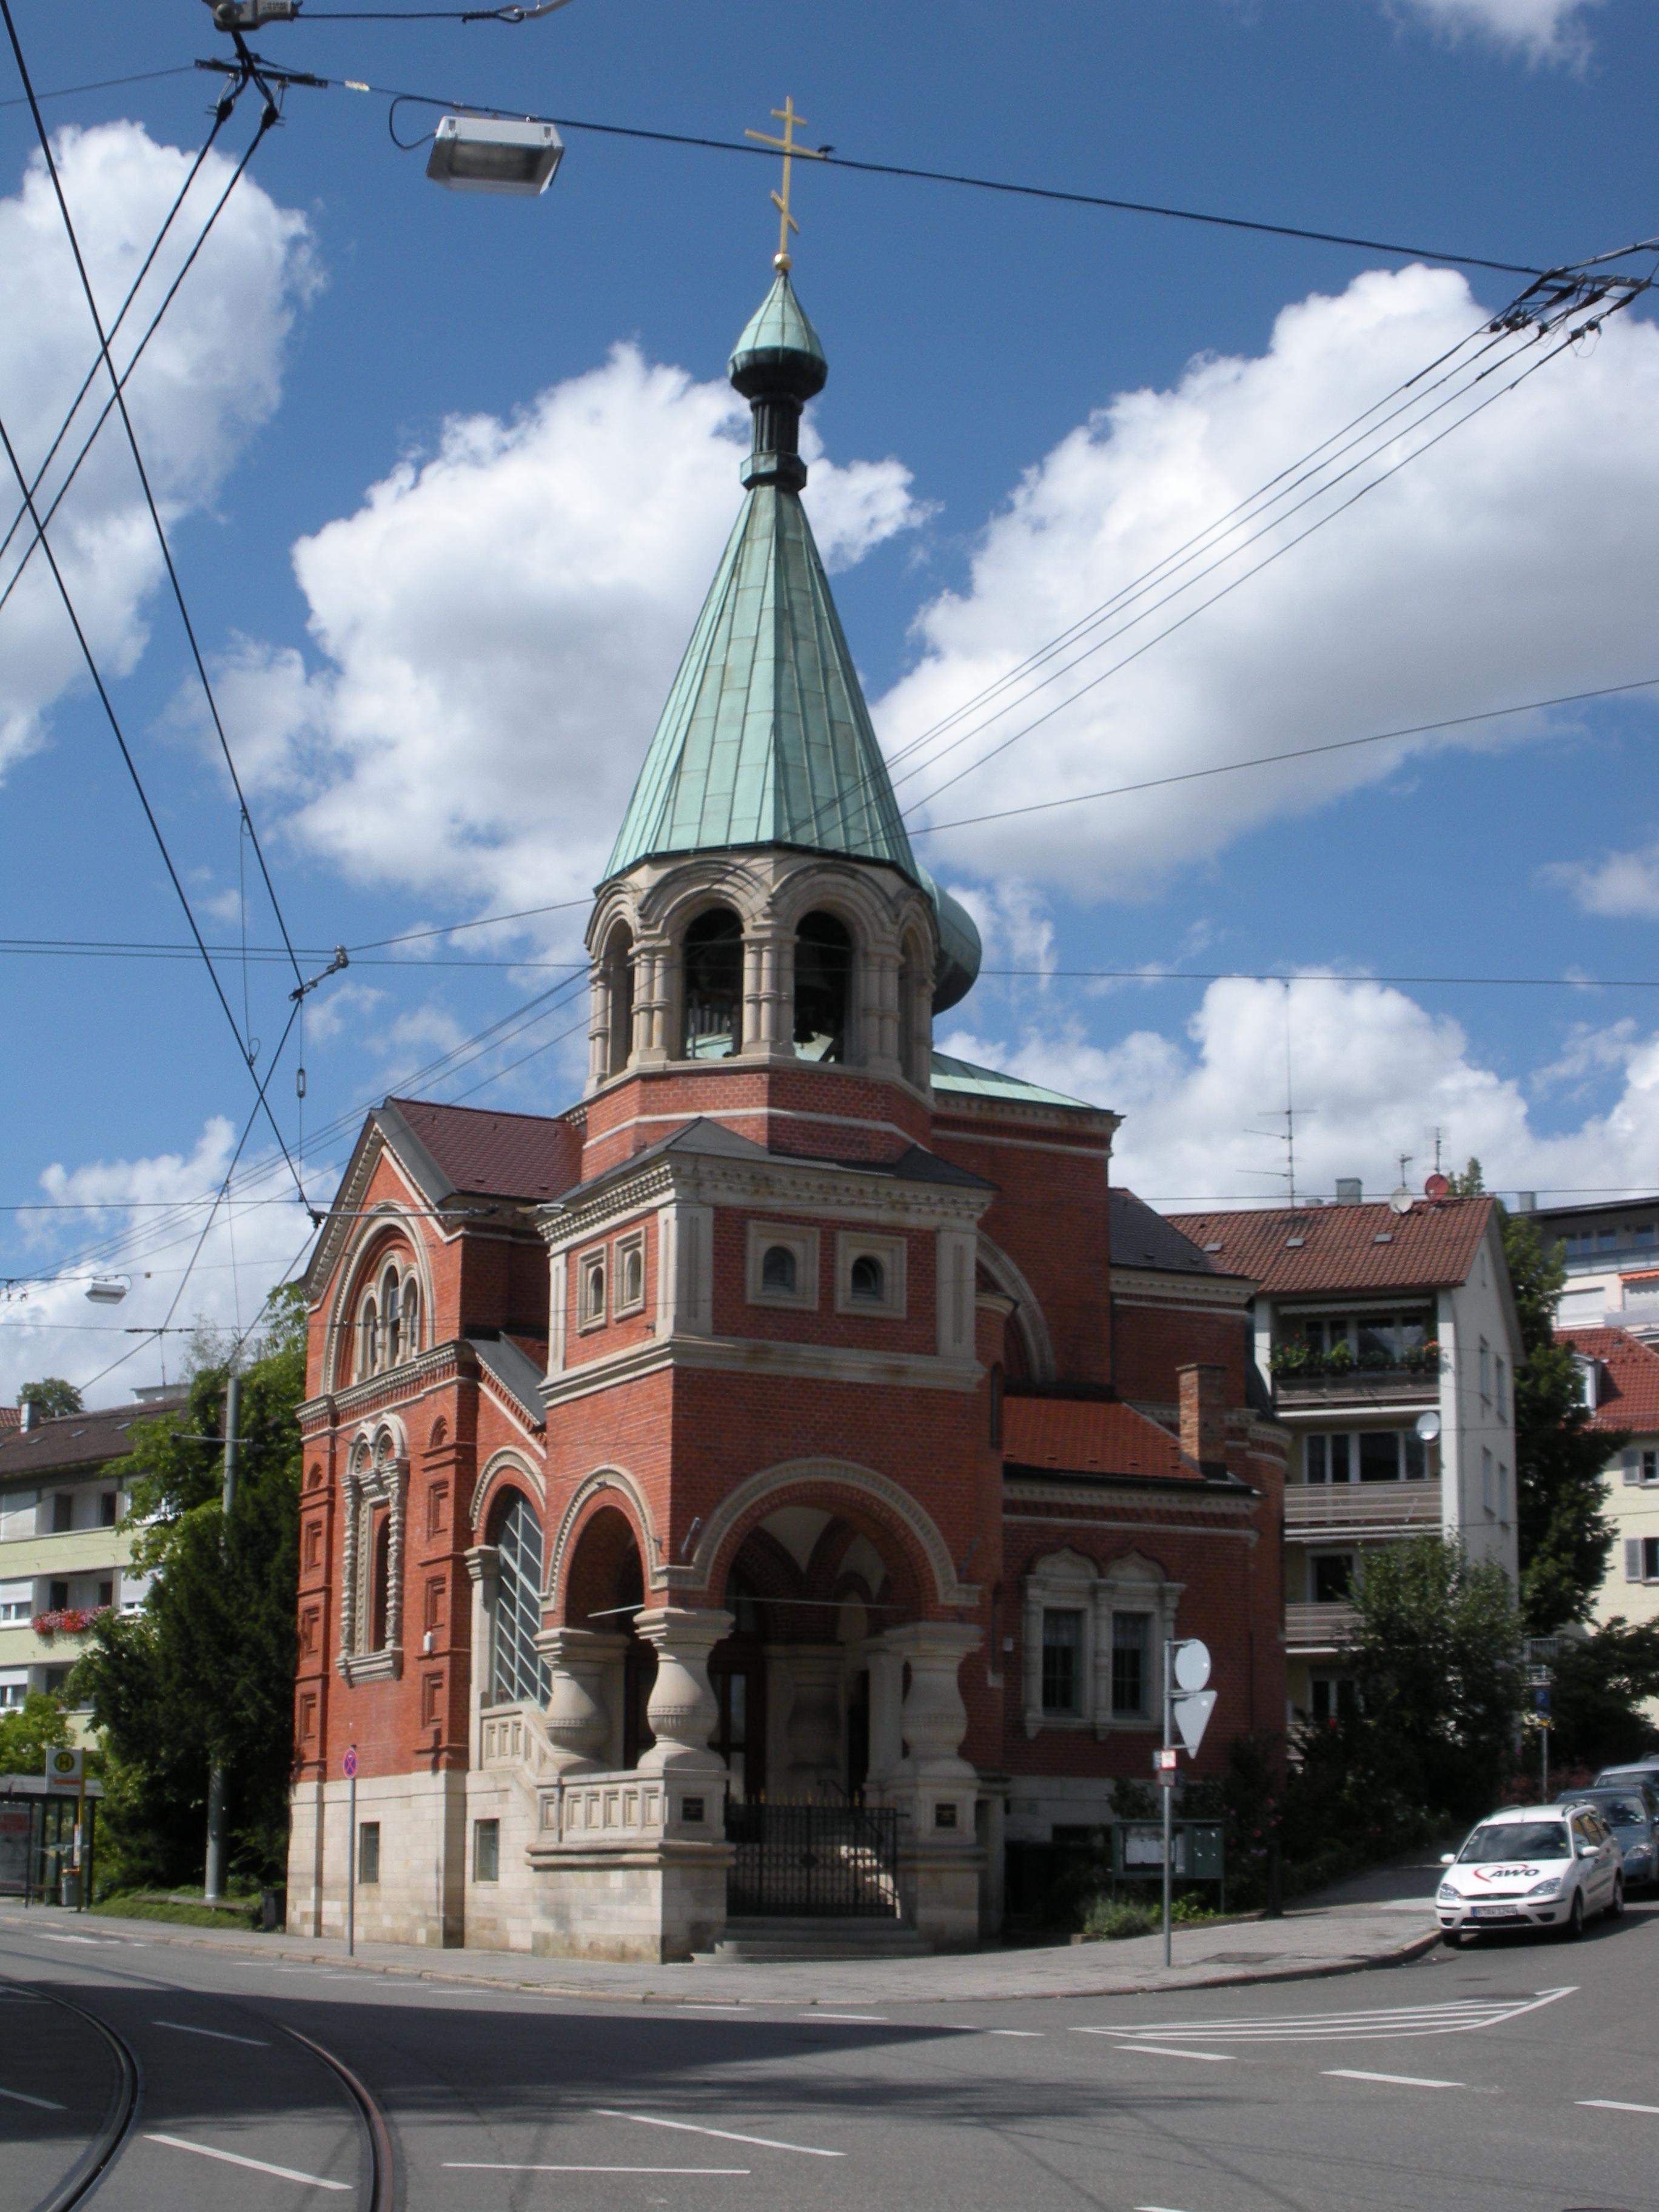 File:Stuttgart - Russische Kirche.JPG - Wikimedia Commons